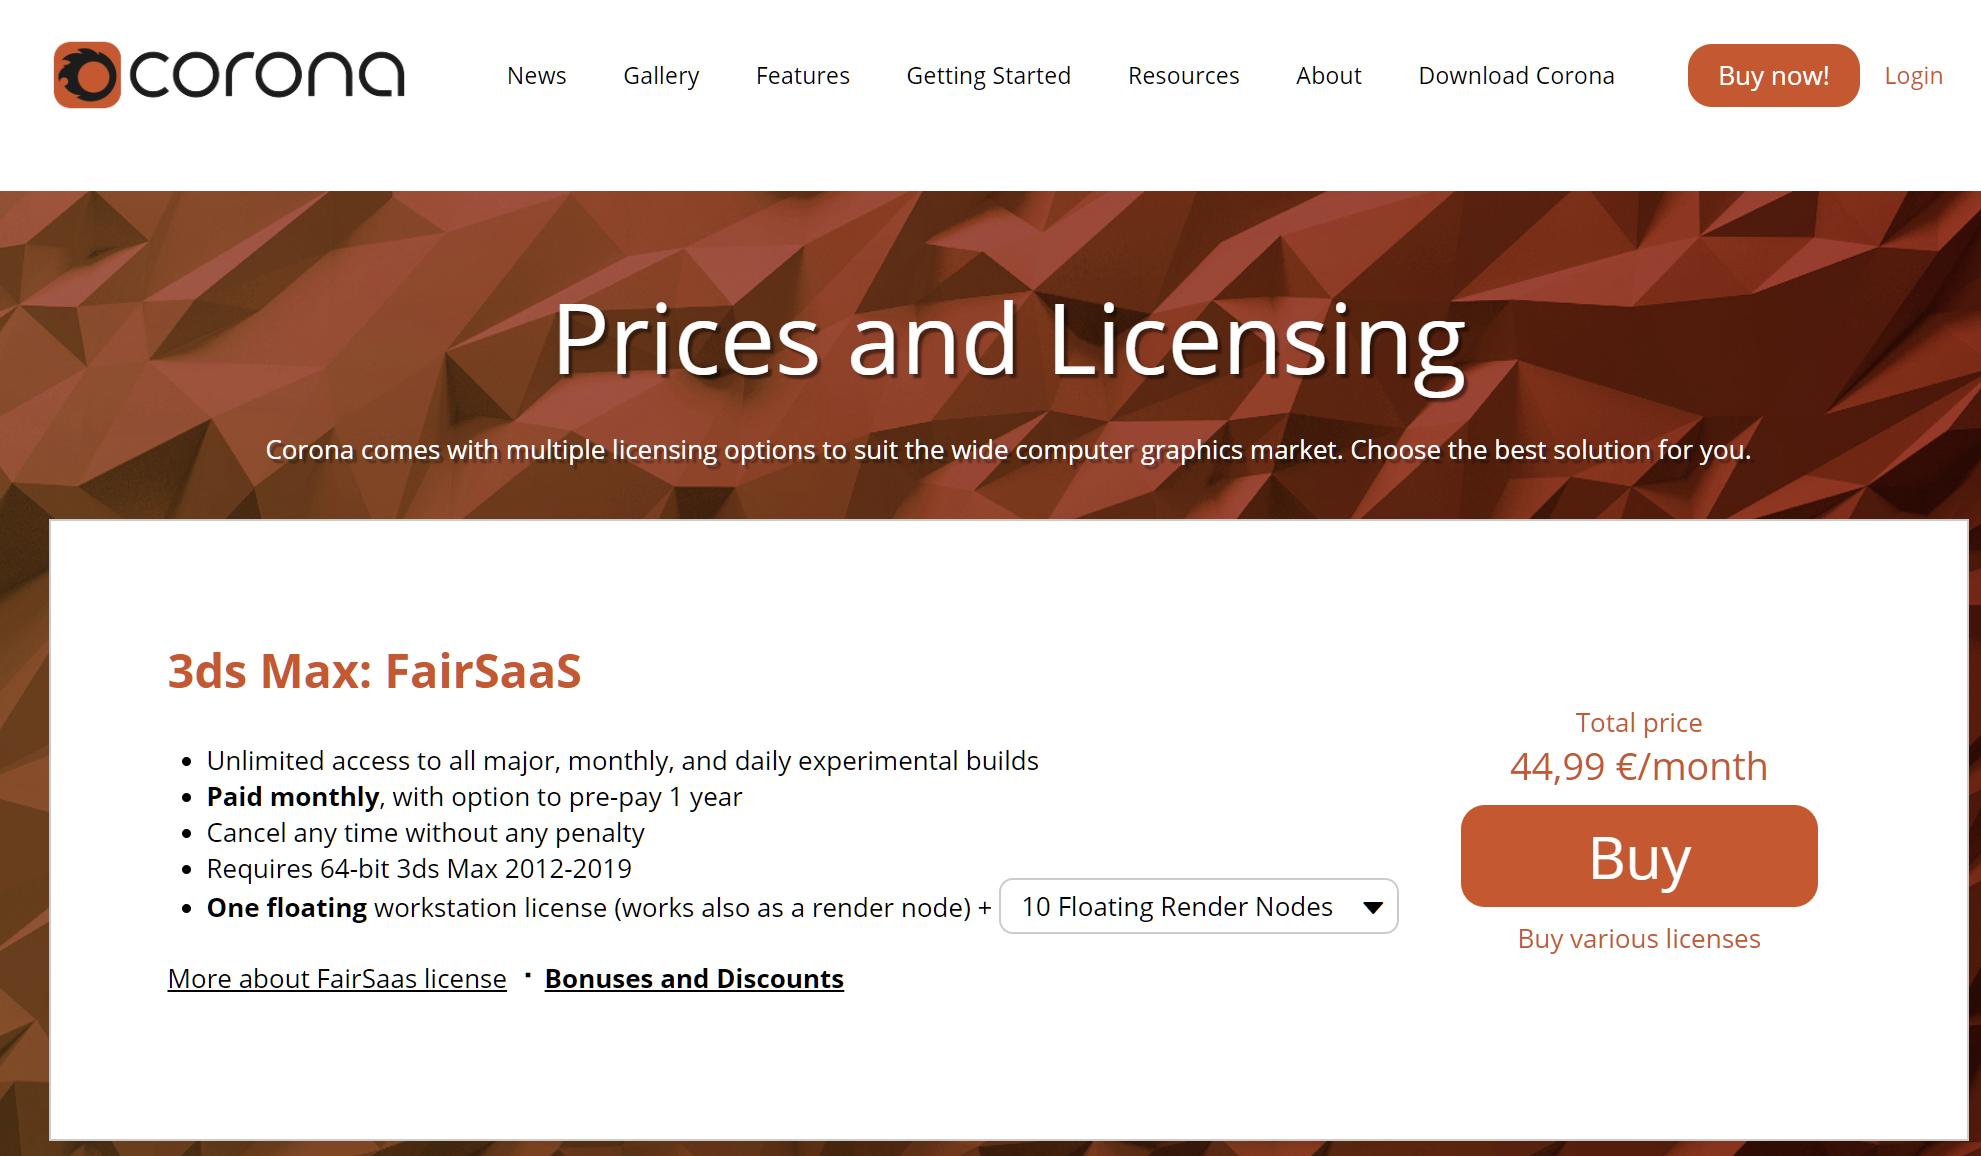 corona_pricing.png.773f3eb9d60cbd685959f776812f765c.png